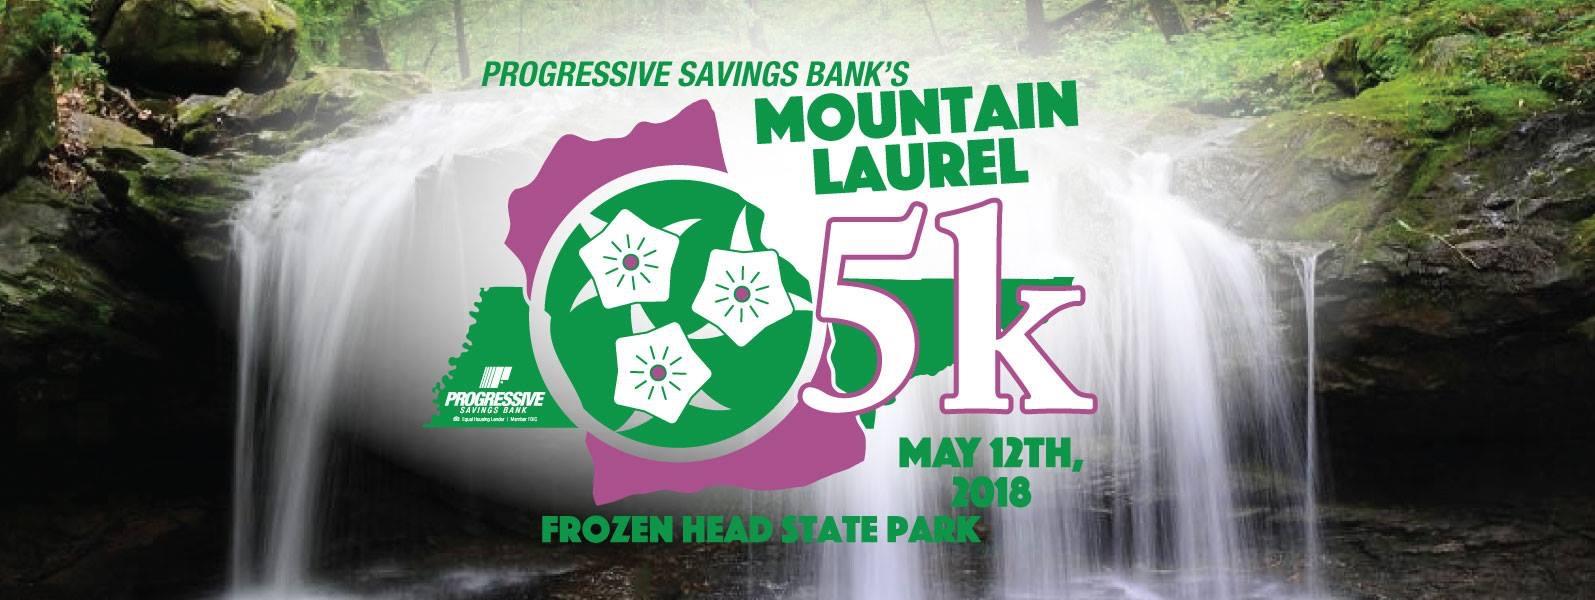 Mountain Laurel 5K Run-May 12, 2018